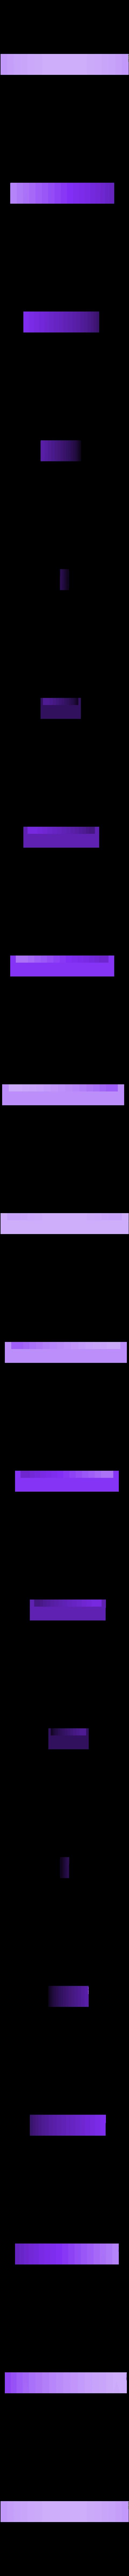 NTV-Roof2-tv.STL Download free STL file Simple boxcar • Design to 3D print, polkin